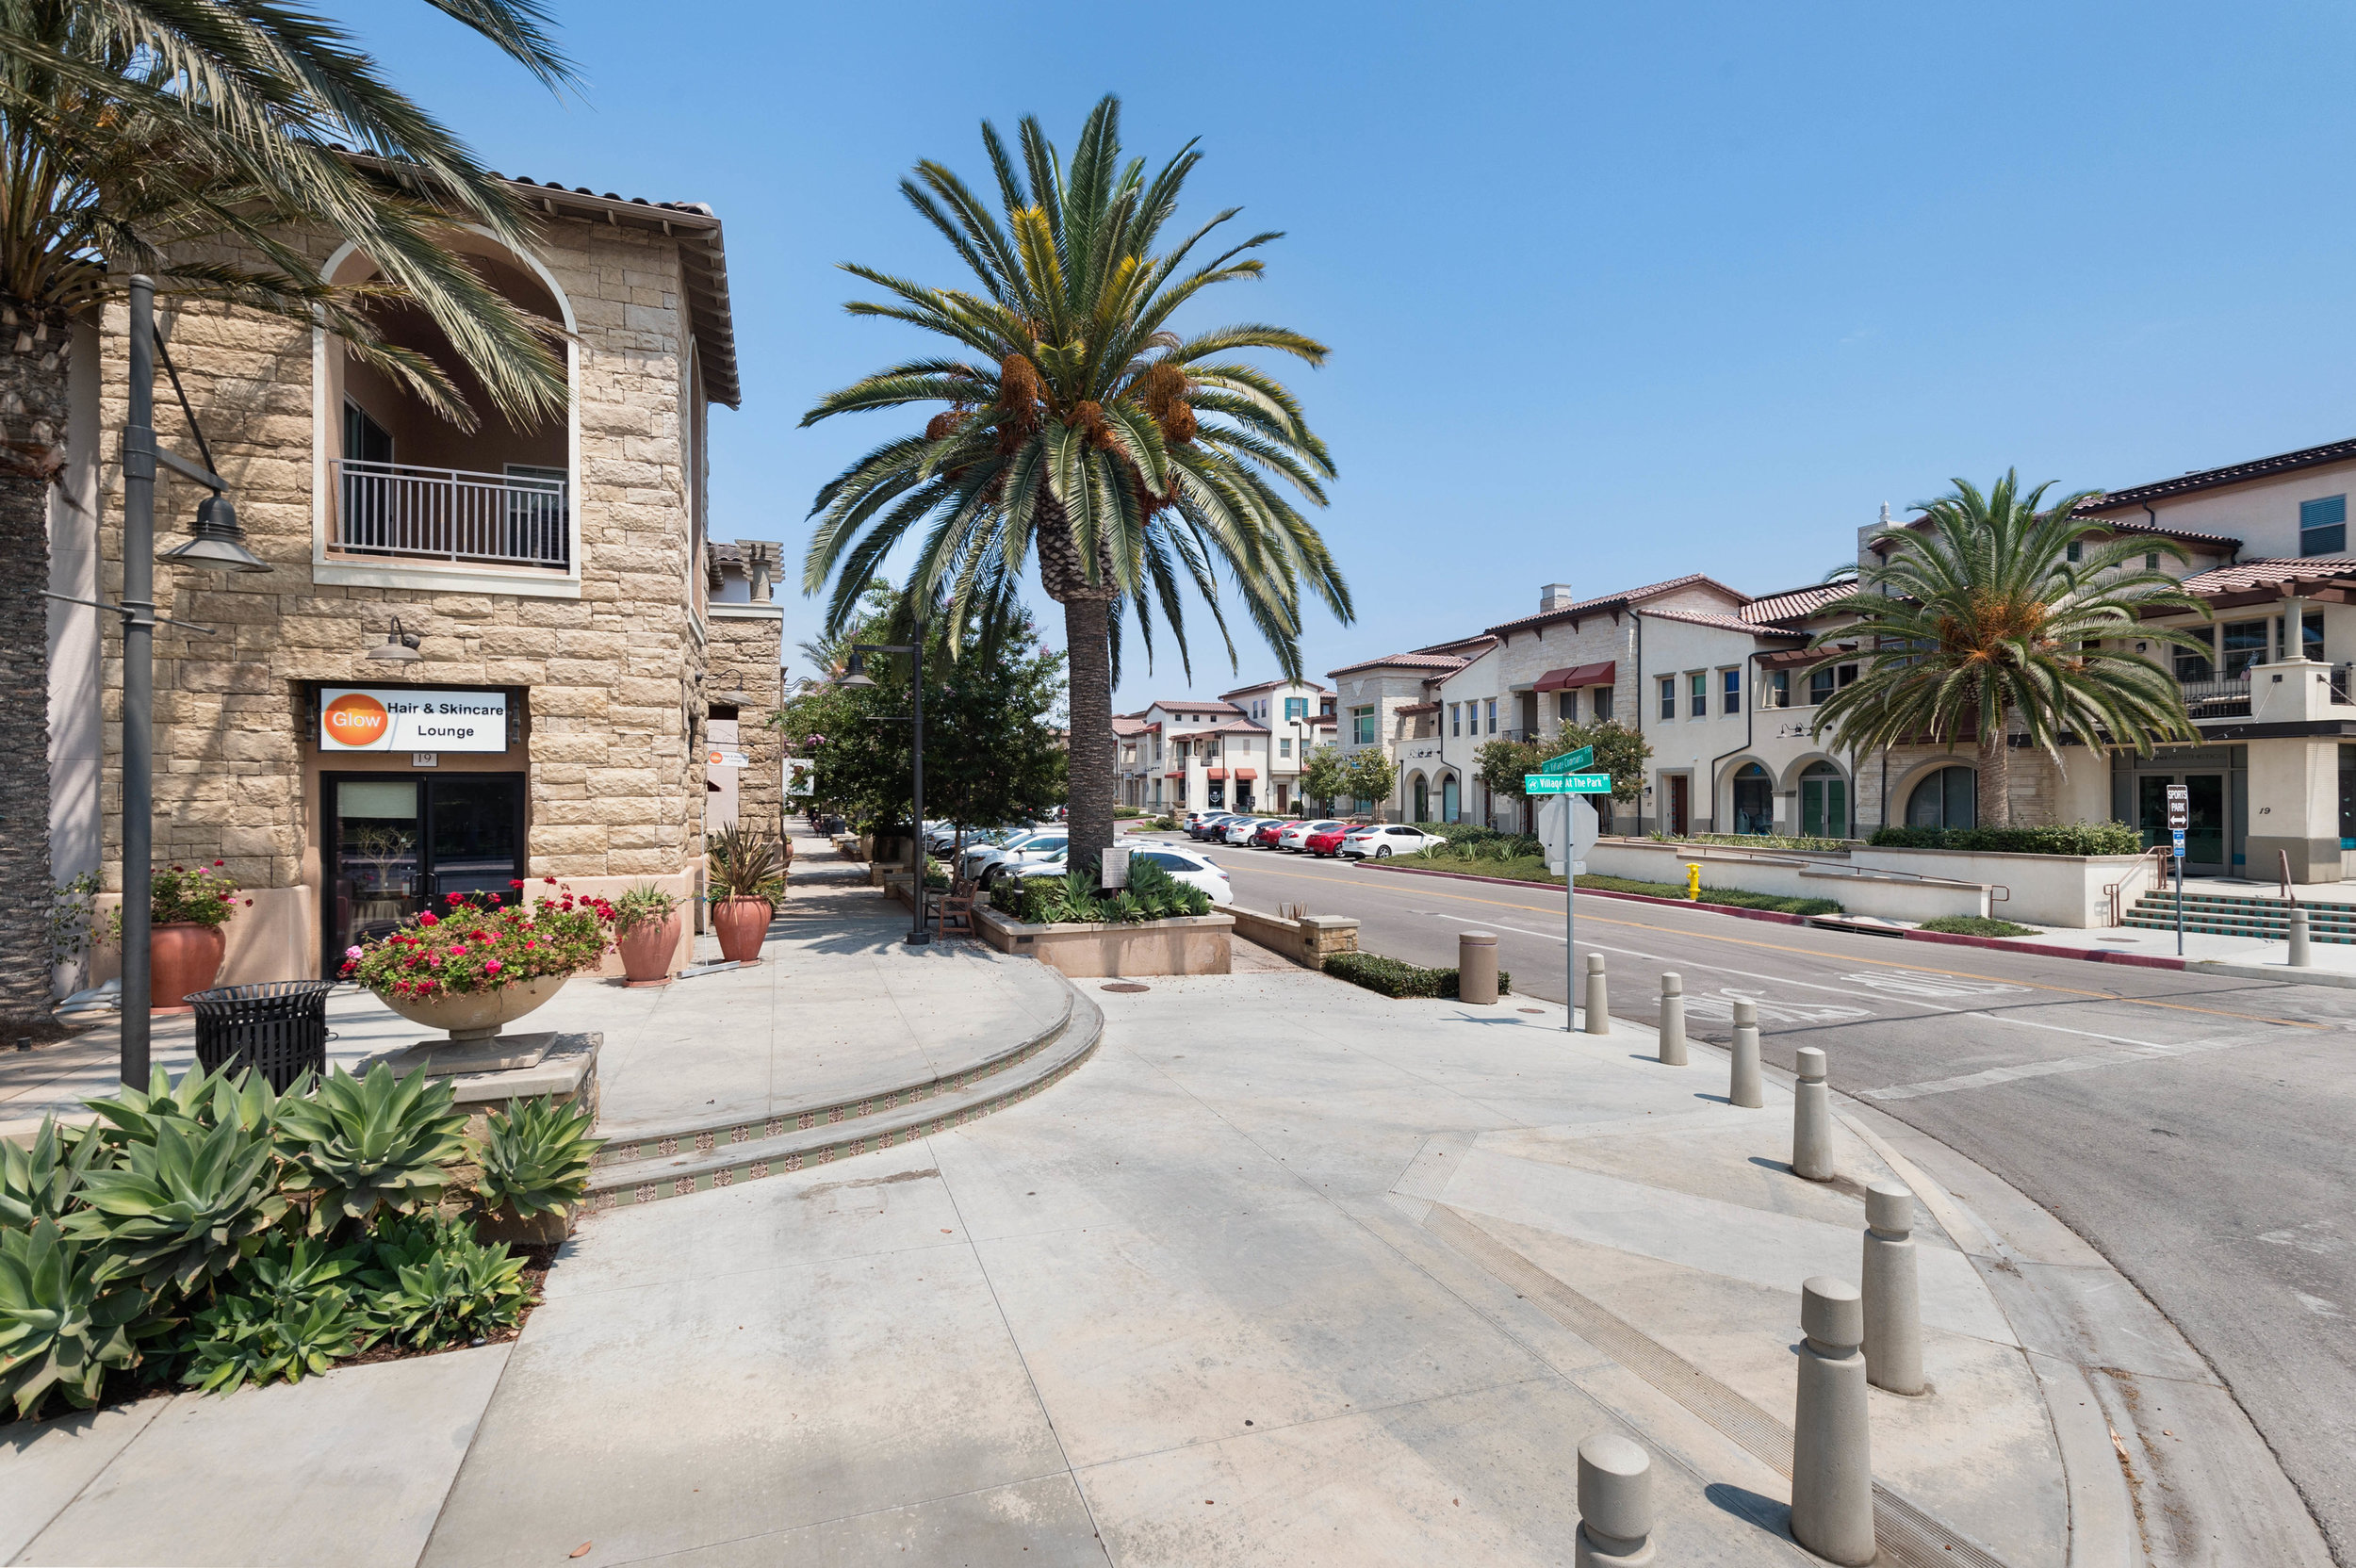 027 Village Shops 207 Westpark Court Unit 702 Camarillo Bally Khehra For Sale Lease The Malibu Life Team Luxury Real Estate.jpg